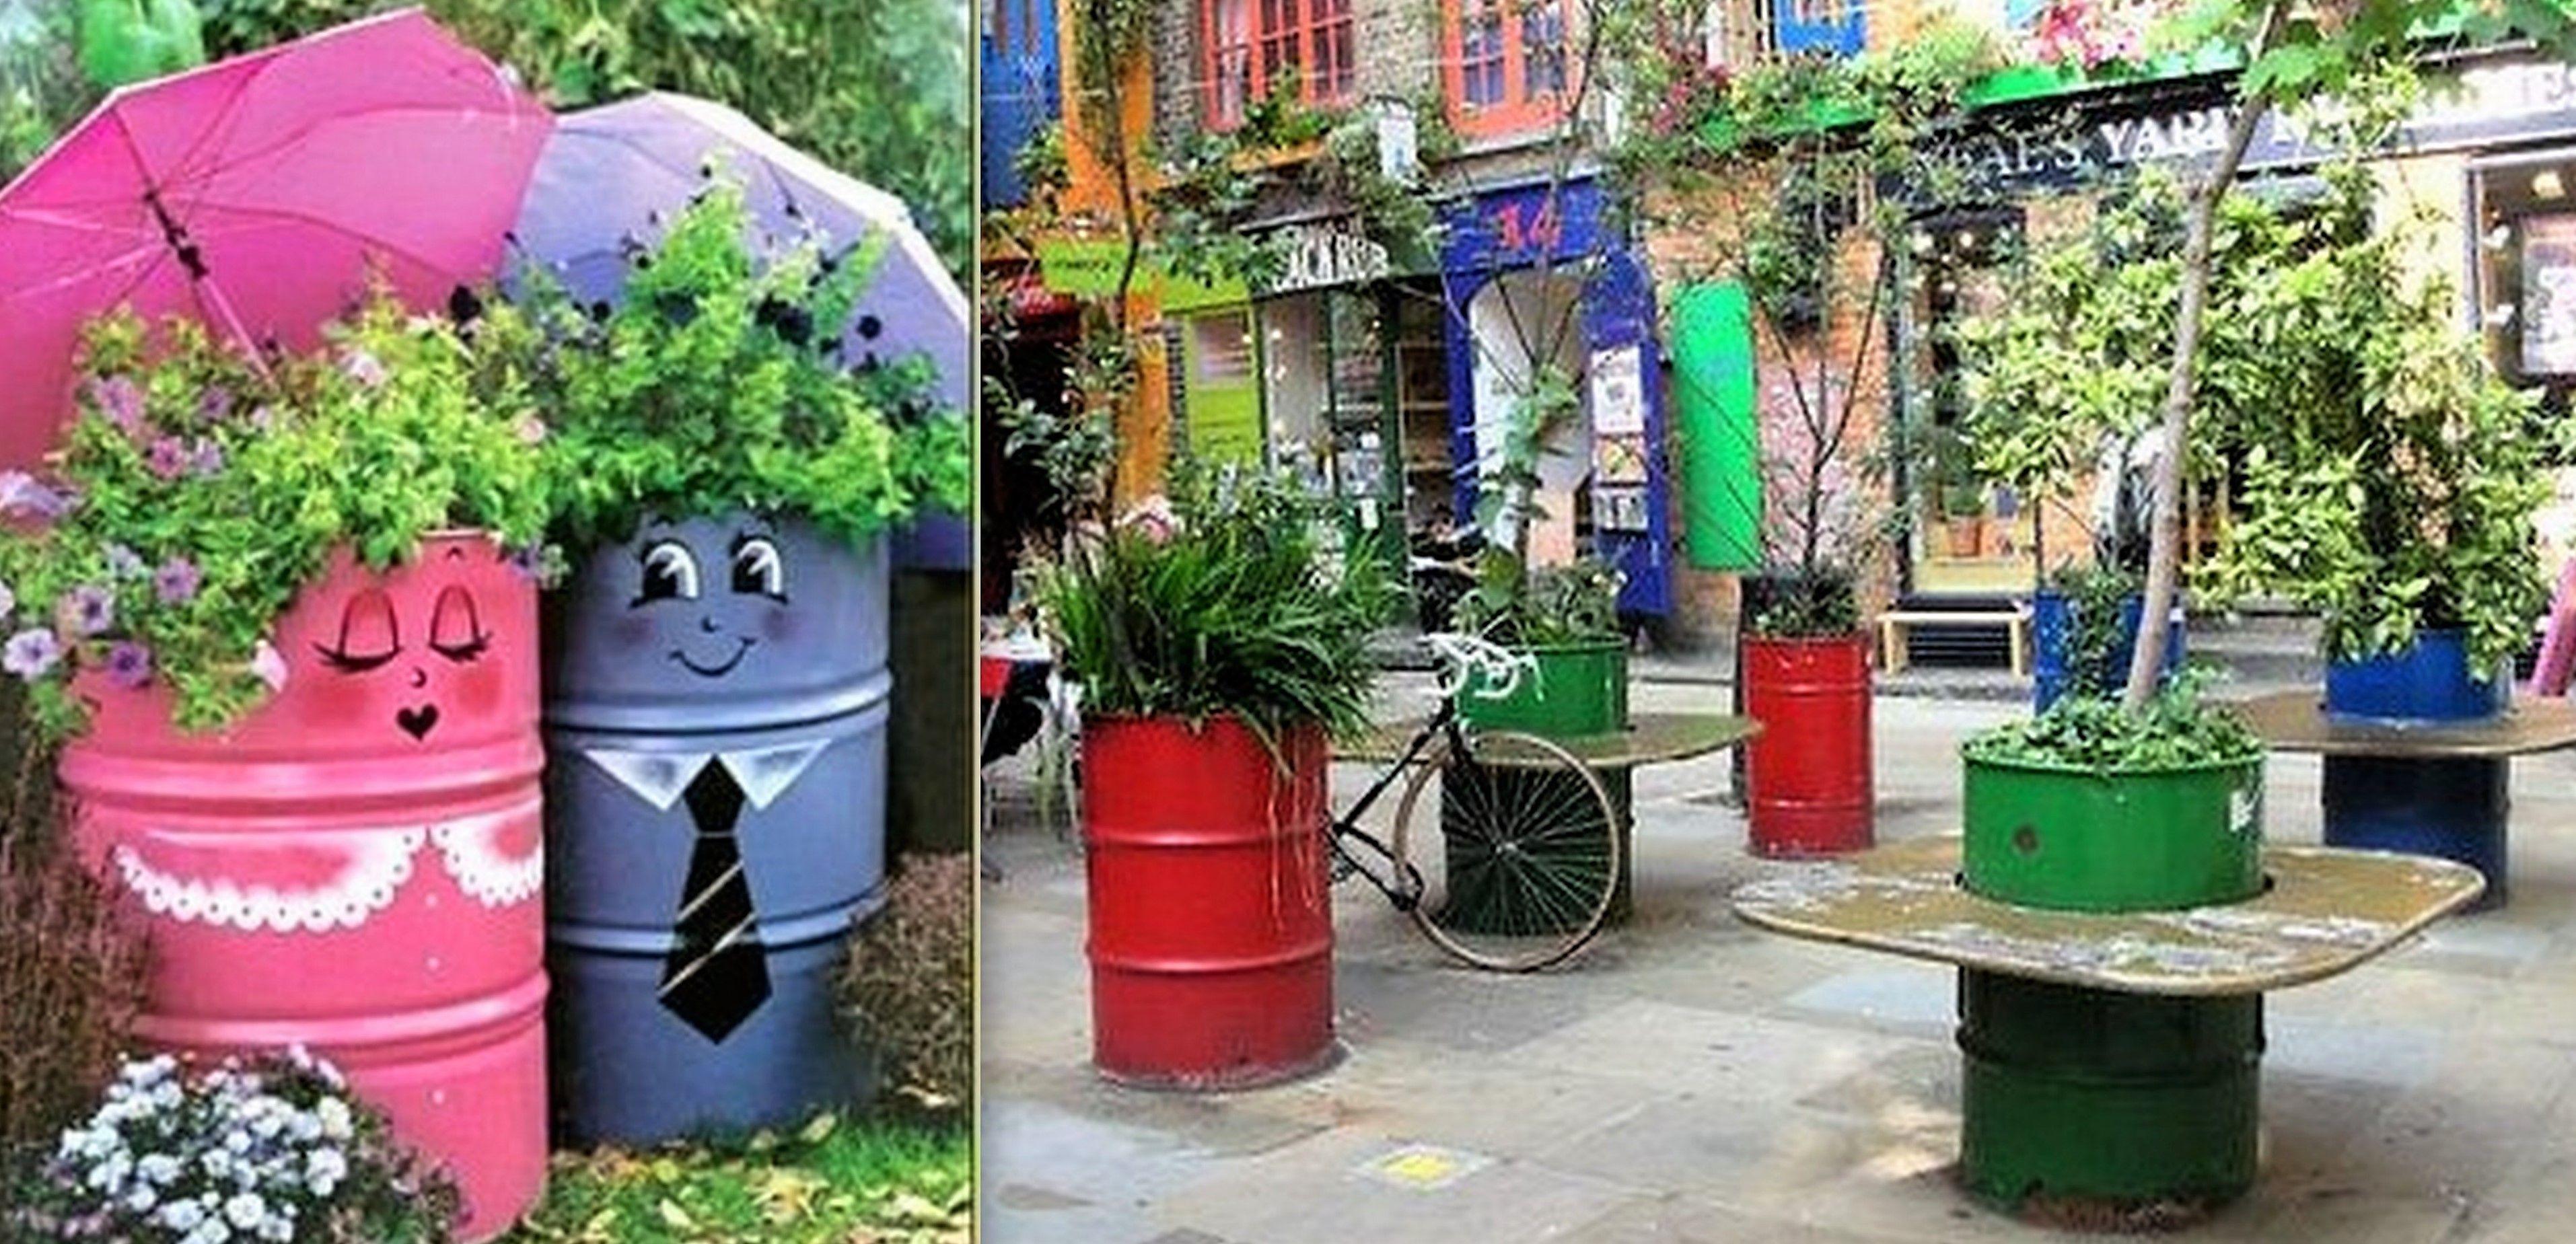 7c06118bc36e03fa1d495a9a2b45c750 Unique De Faire Un Jardin Concept